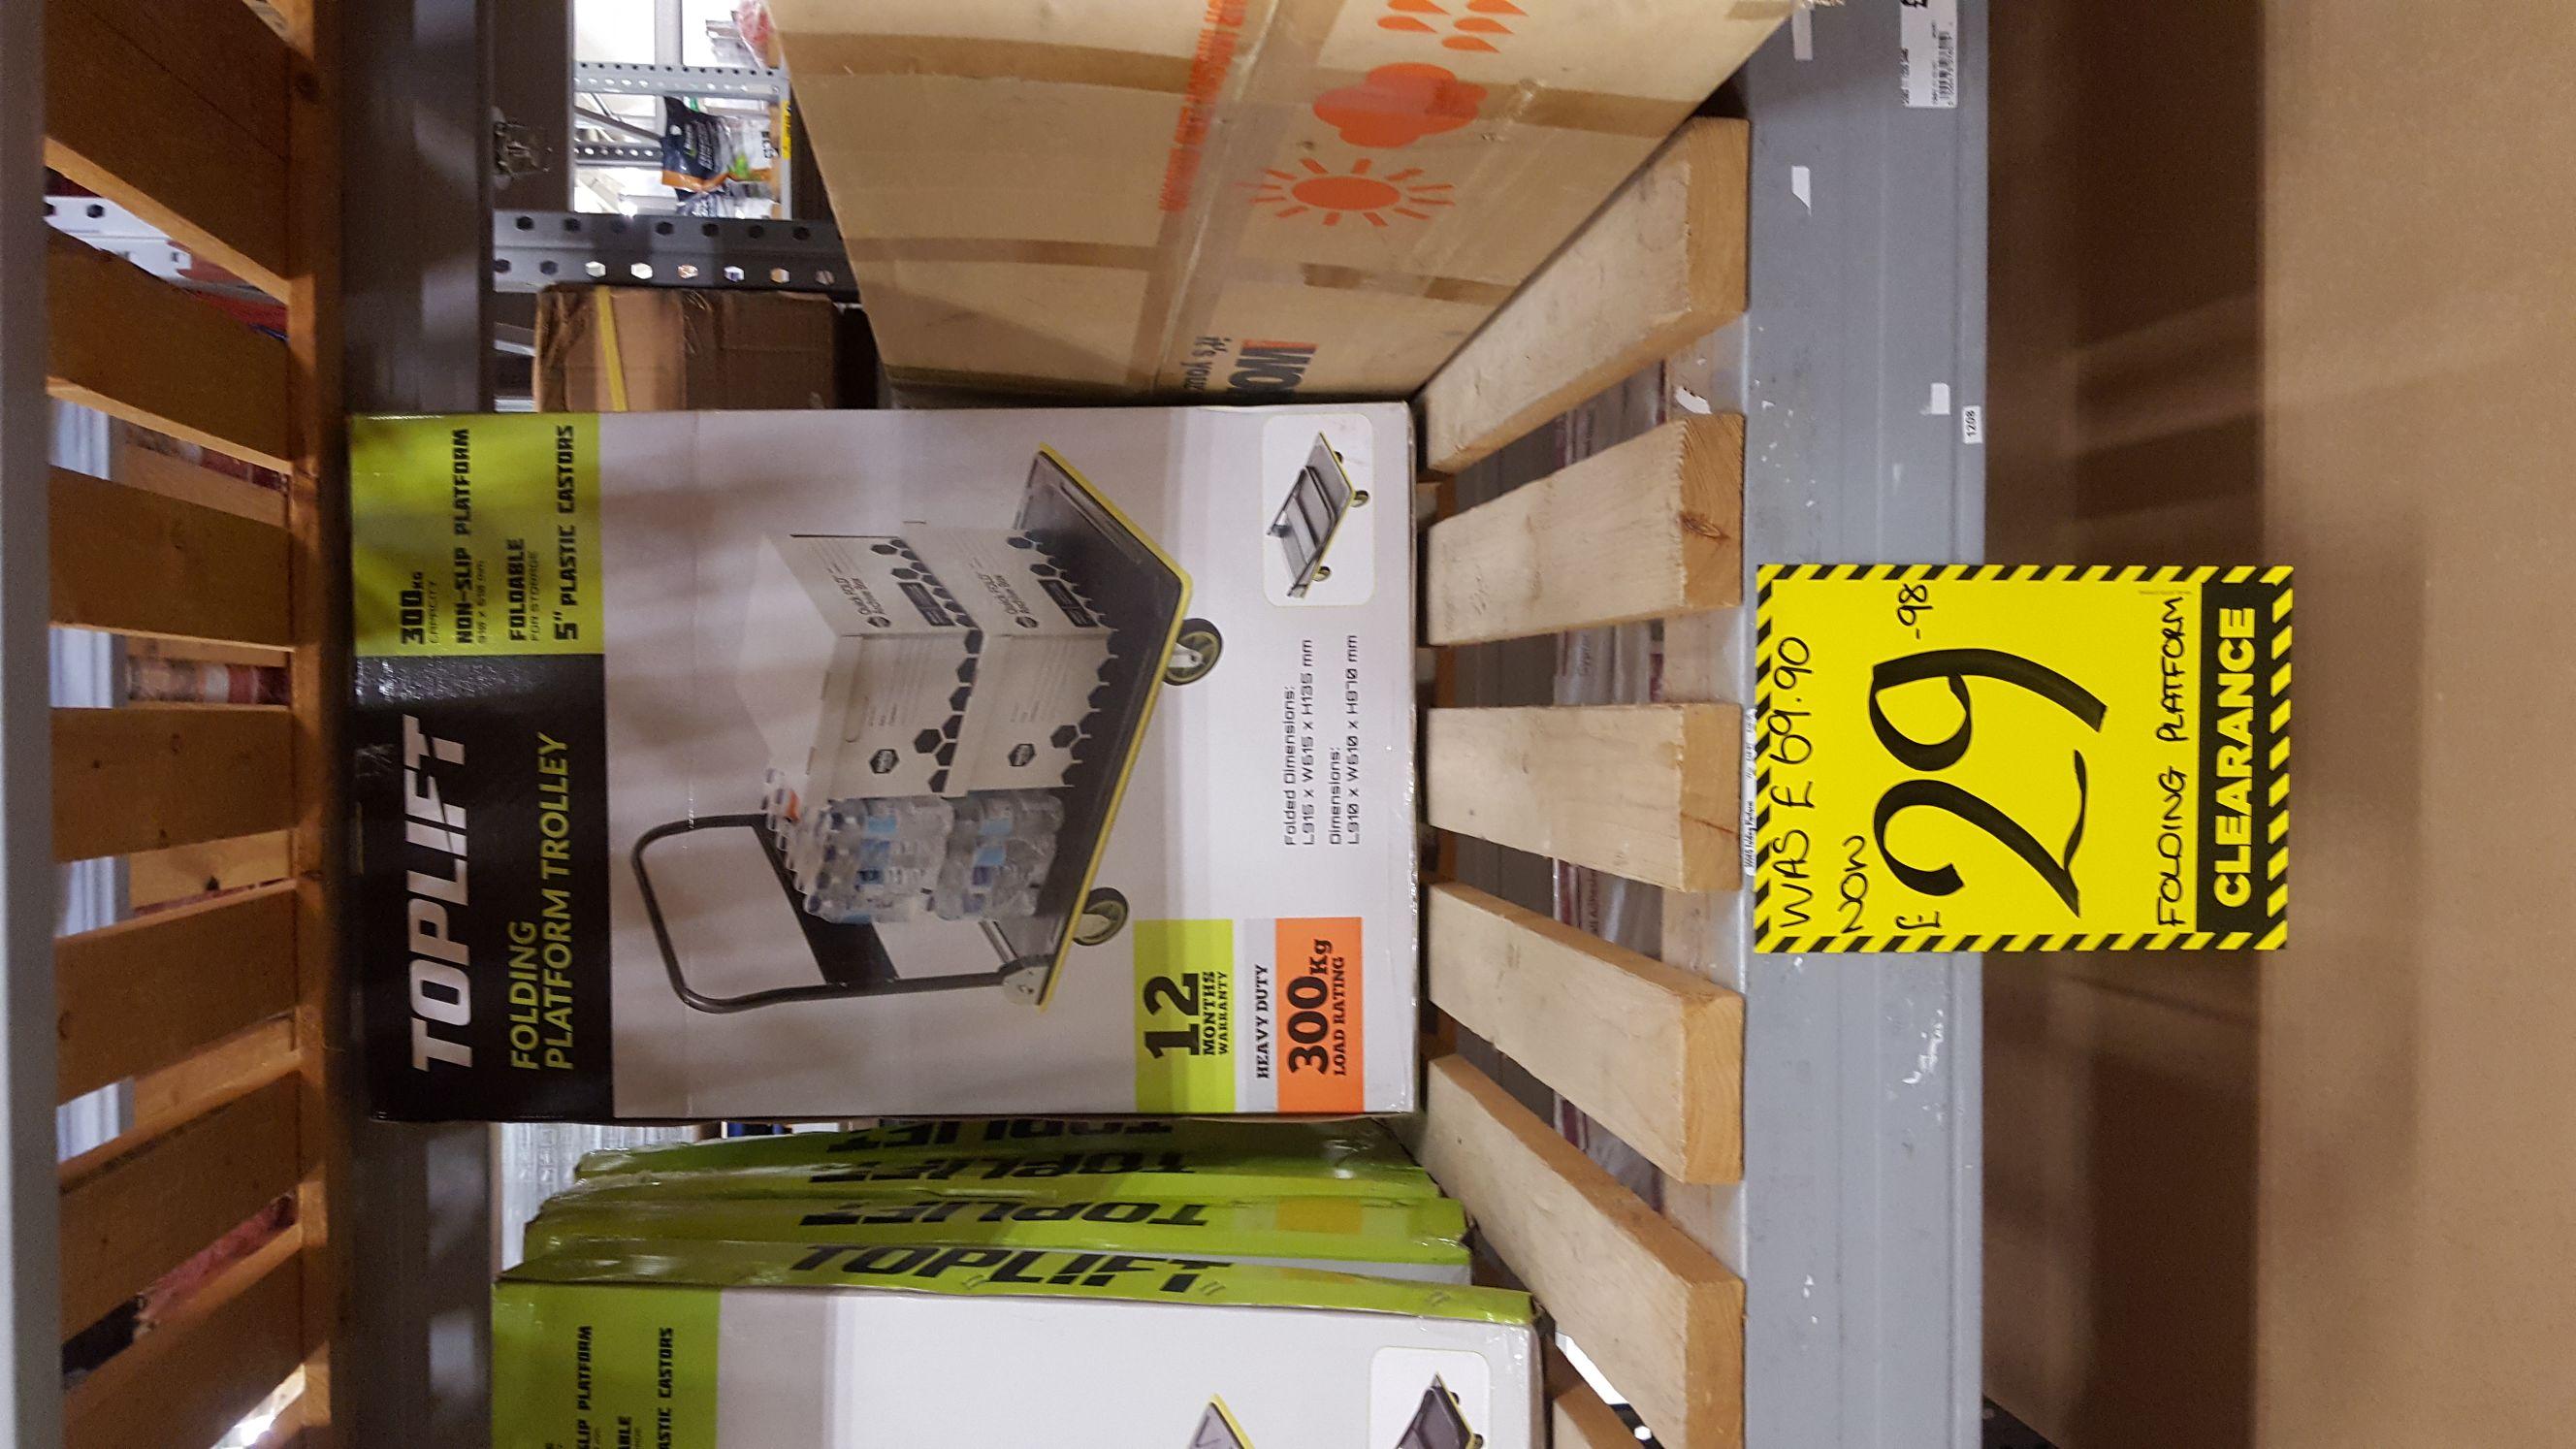 Toplift folding platform trolley 300kg capacity was £69.99 now £29.99 @ Homebase instore